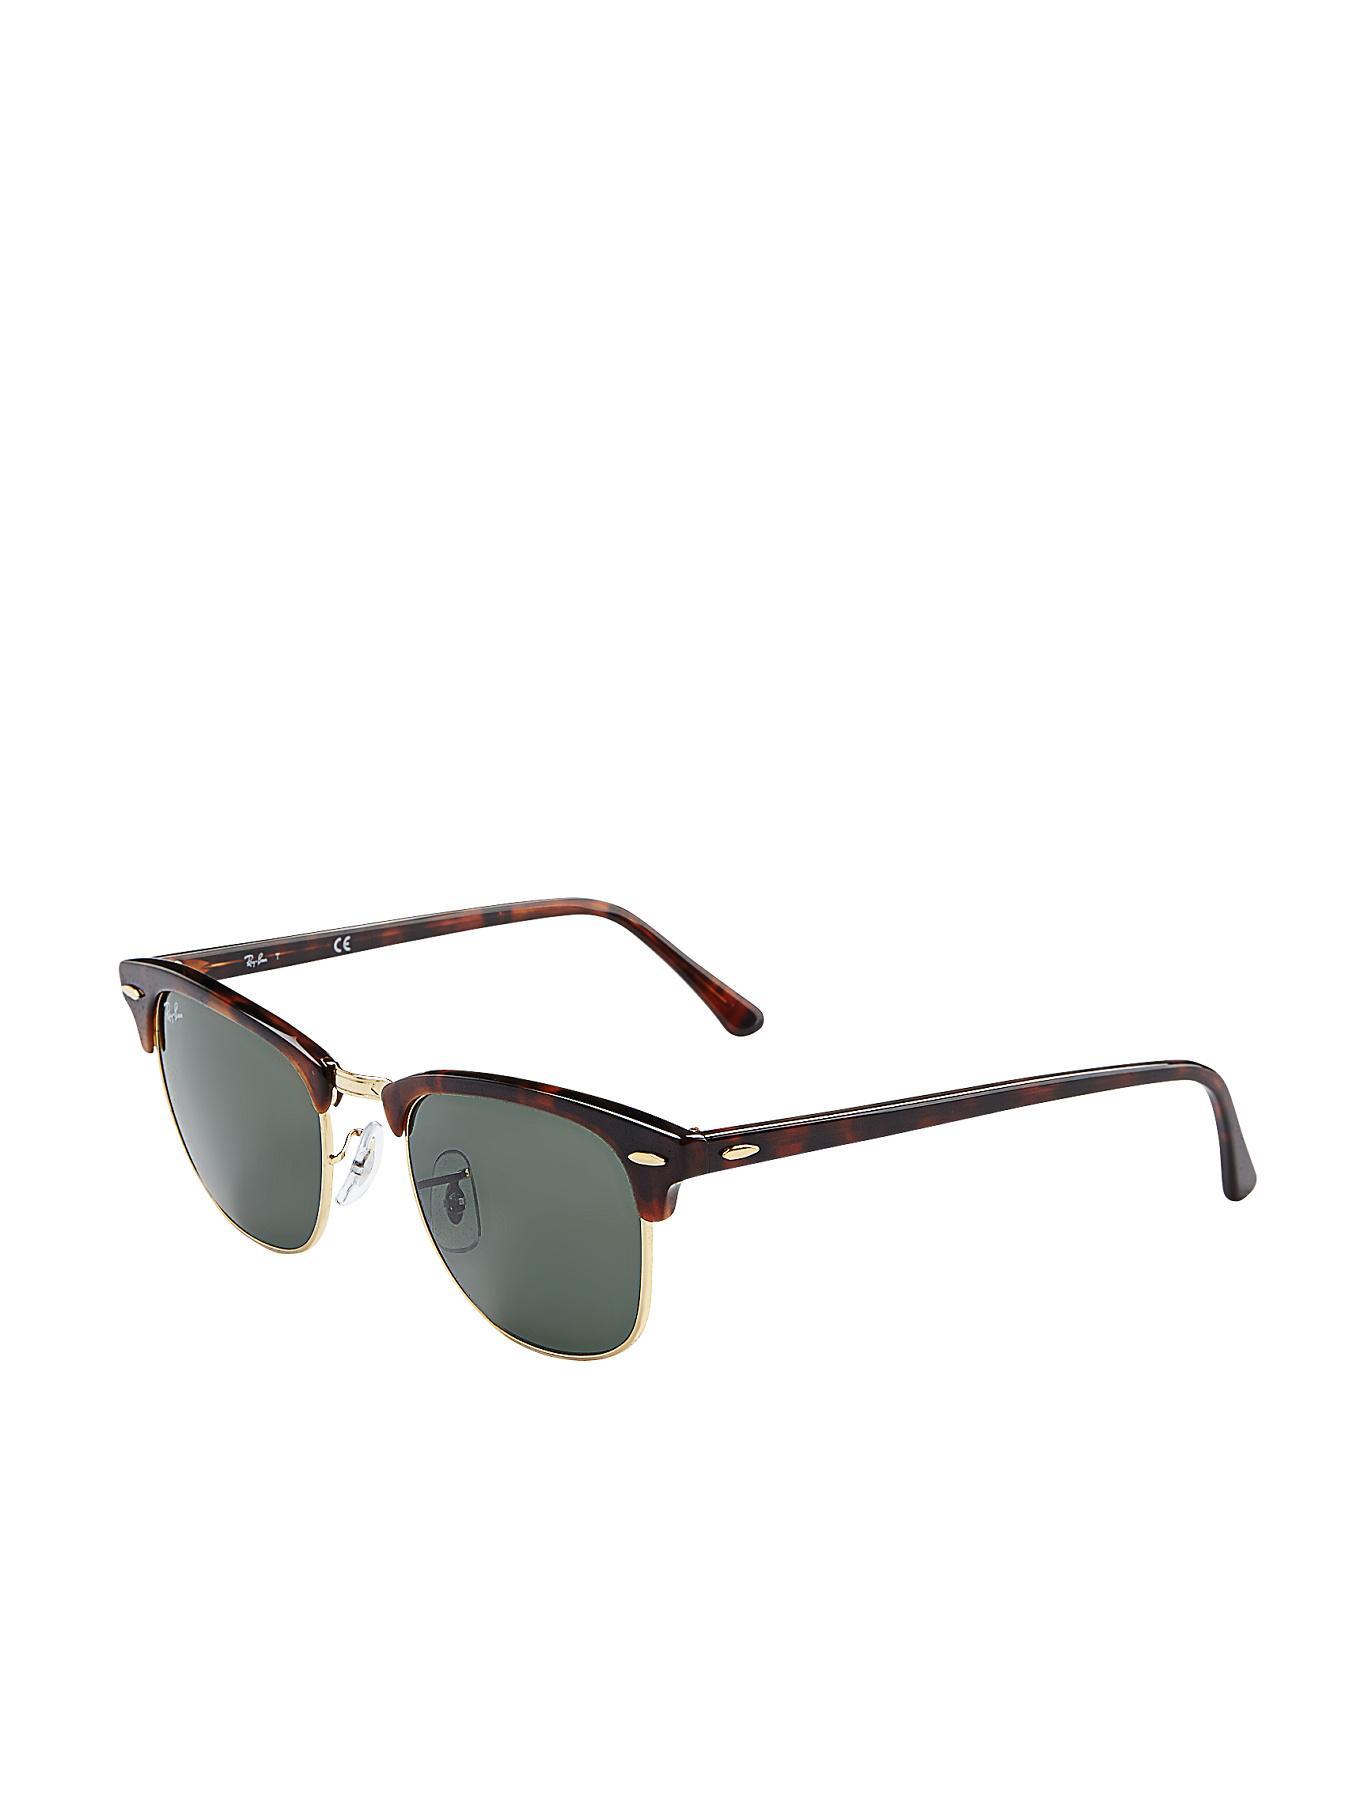 Ray-Ban Clubmaster Sunglasses - Tortoiseshell